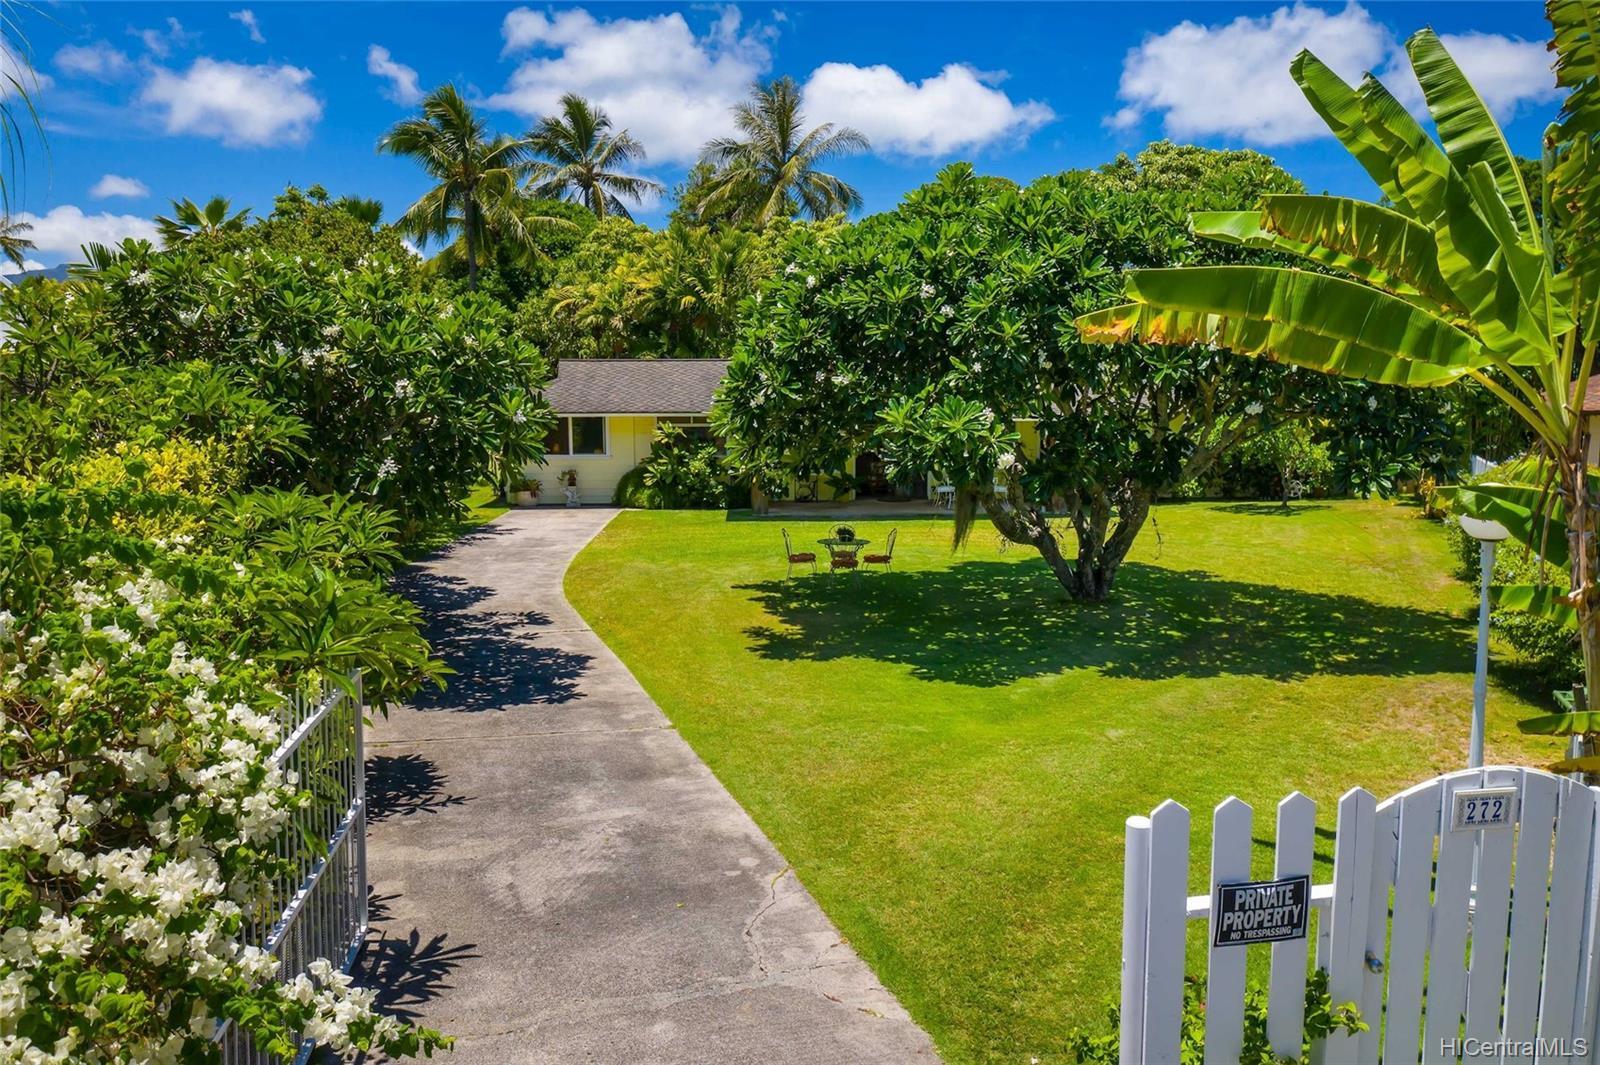 272 Kuupua Street, Kailua HI 96734 - MLS #201922811 - Honolulu Real